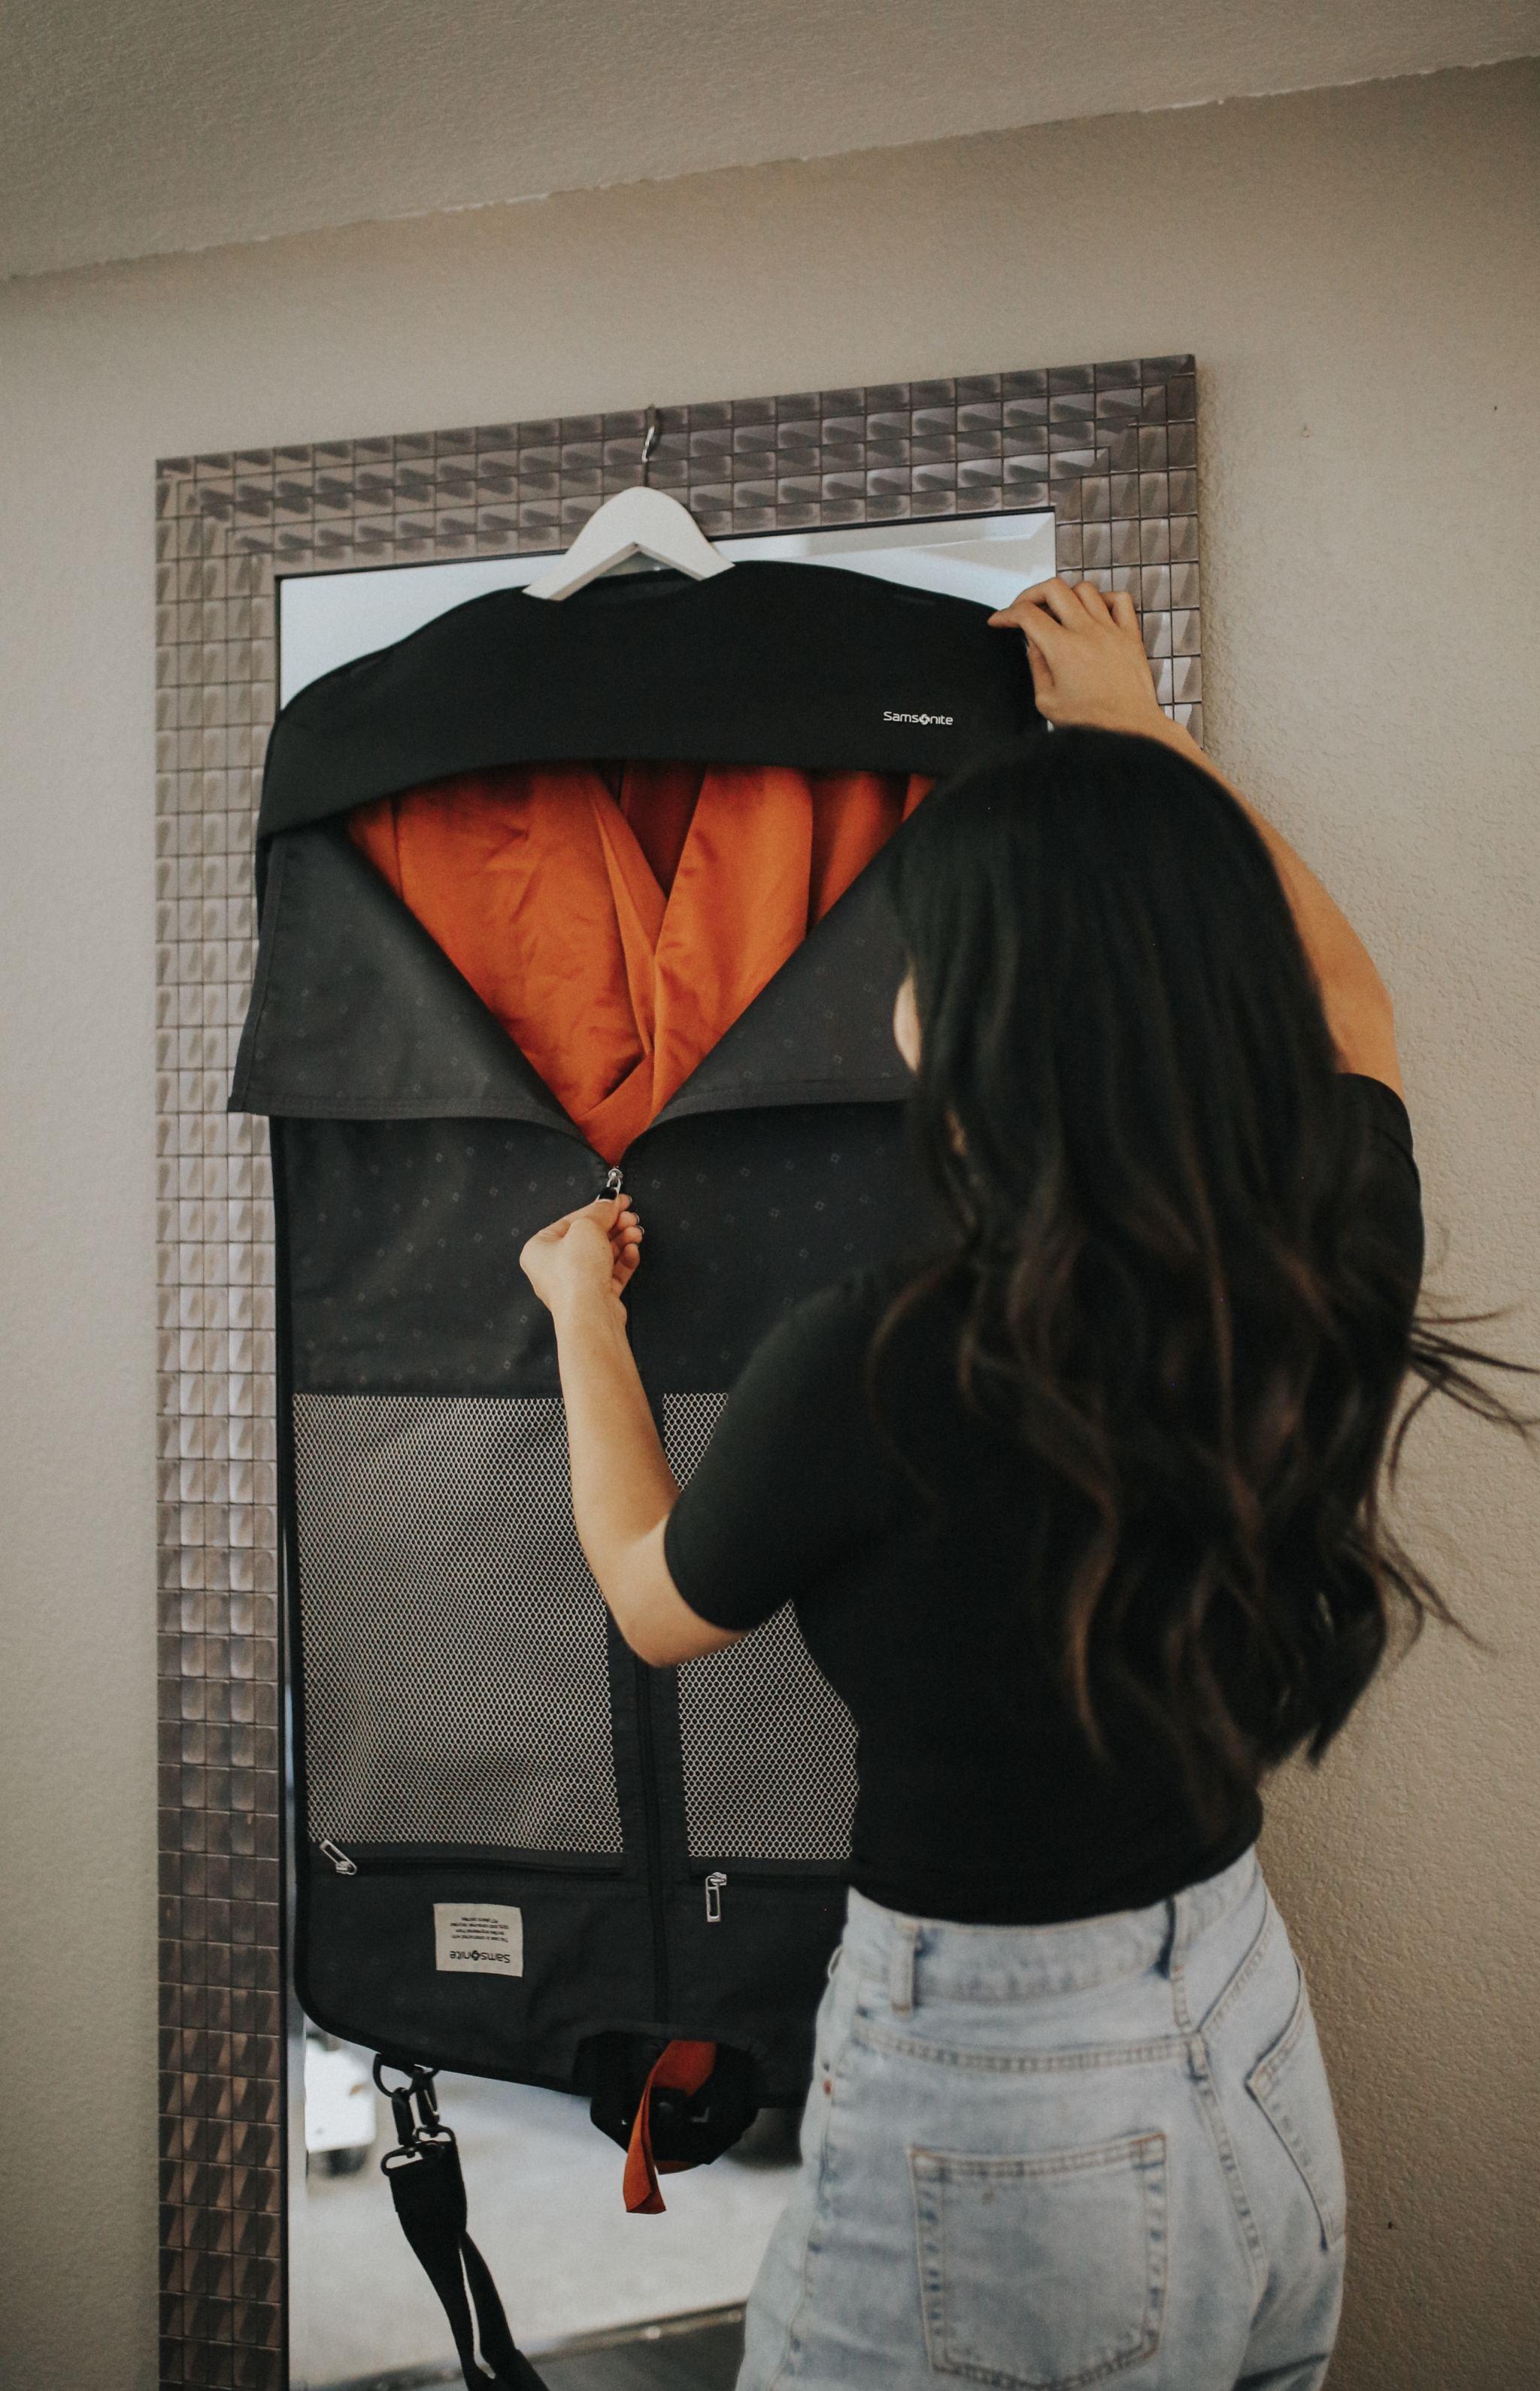 samsonite travel garment sleeve bag